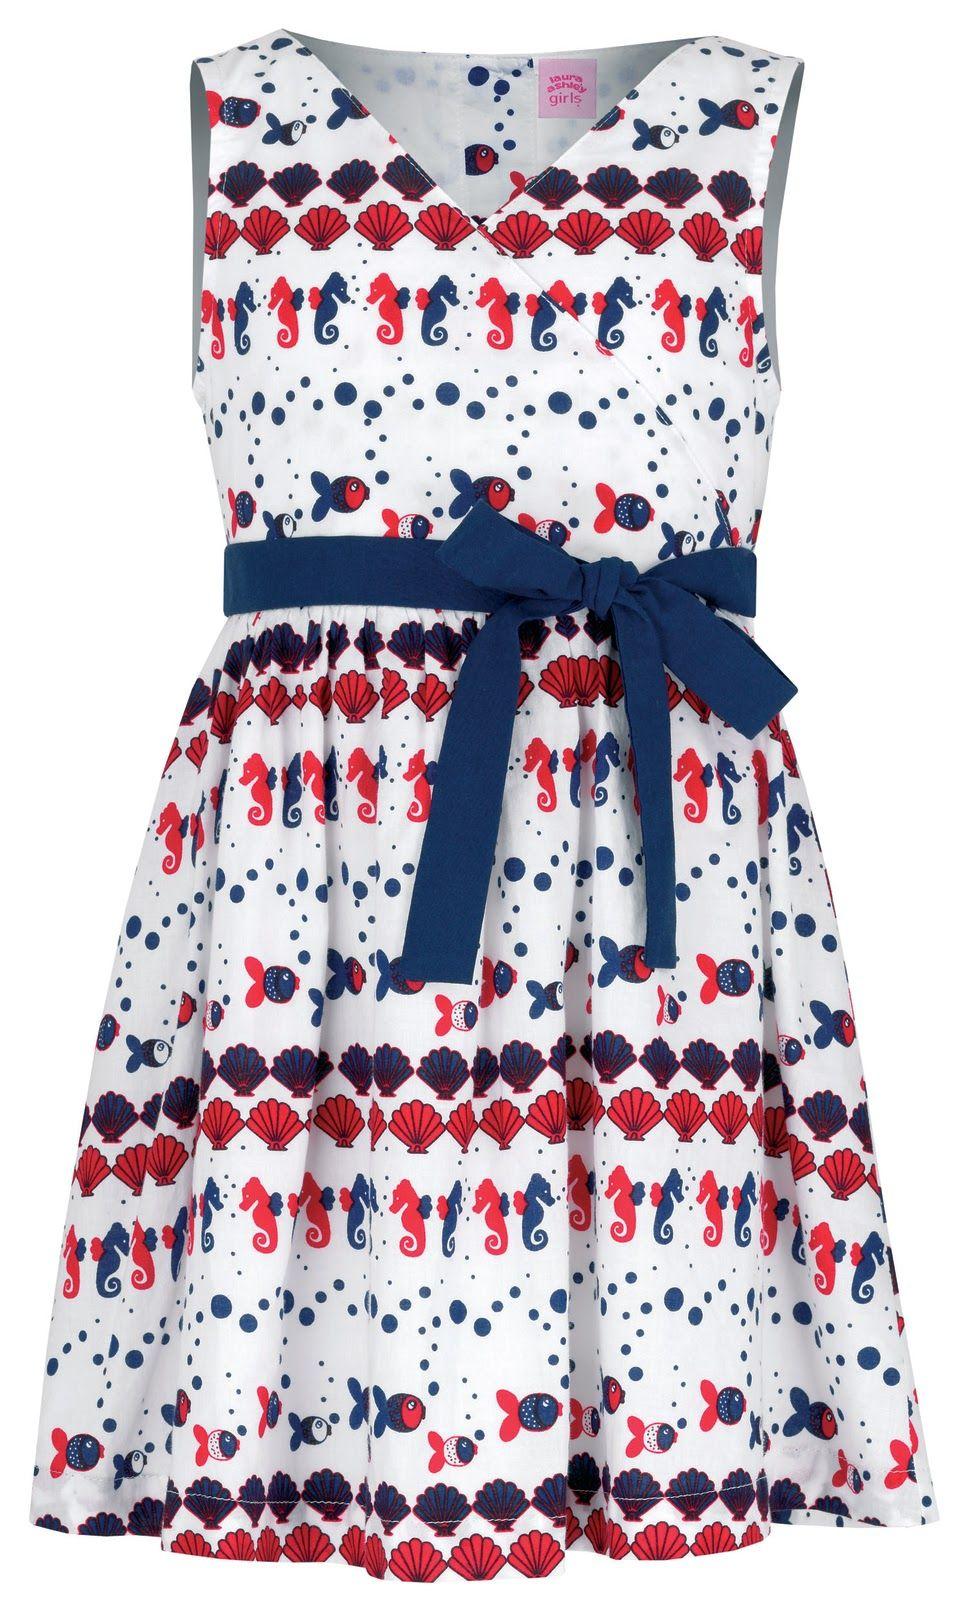 laura ashley seashore dress